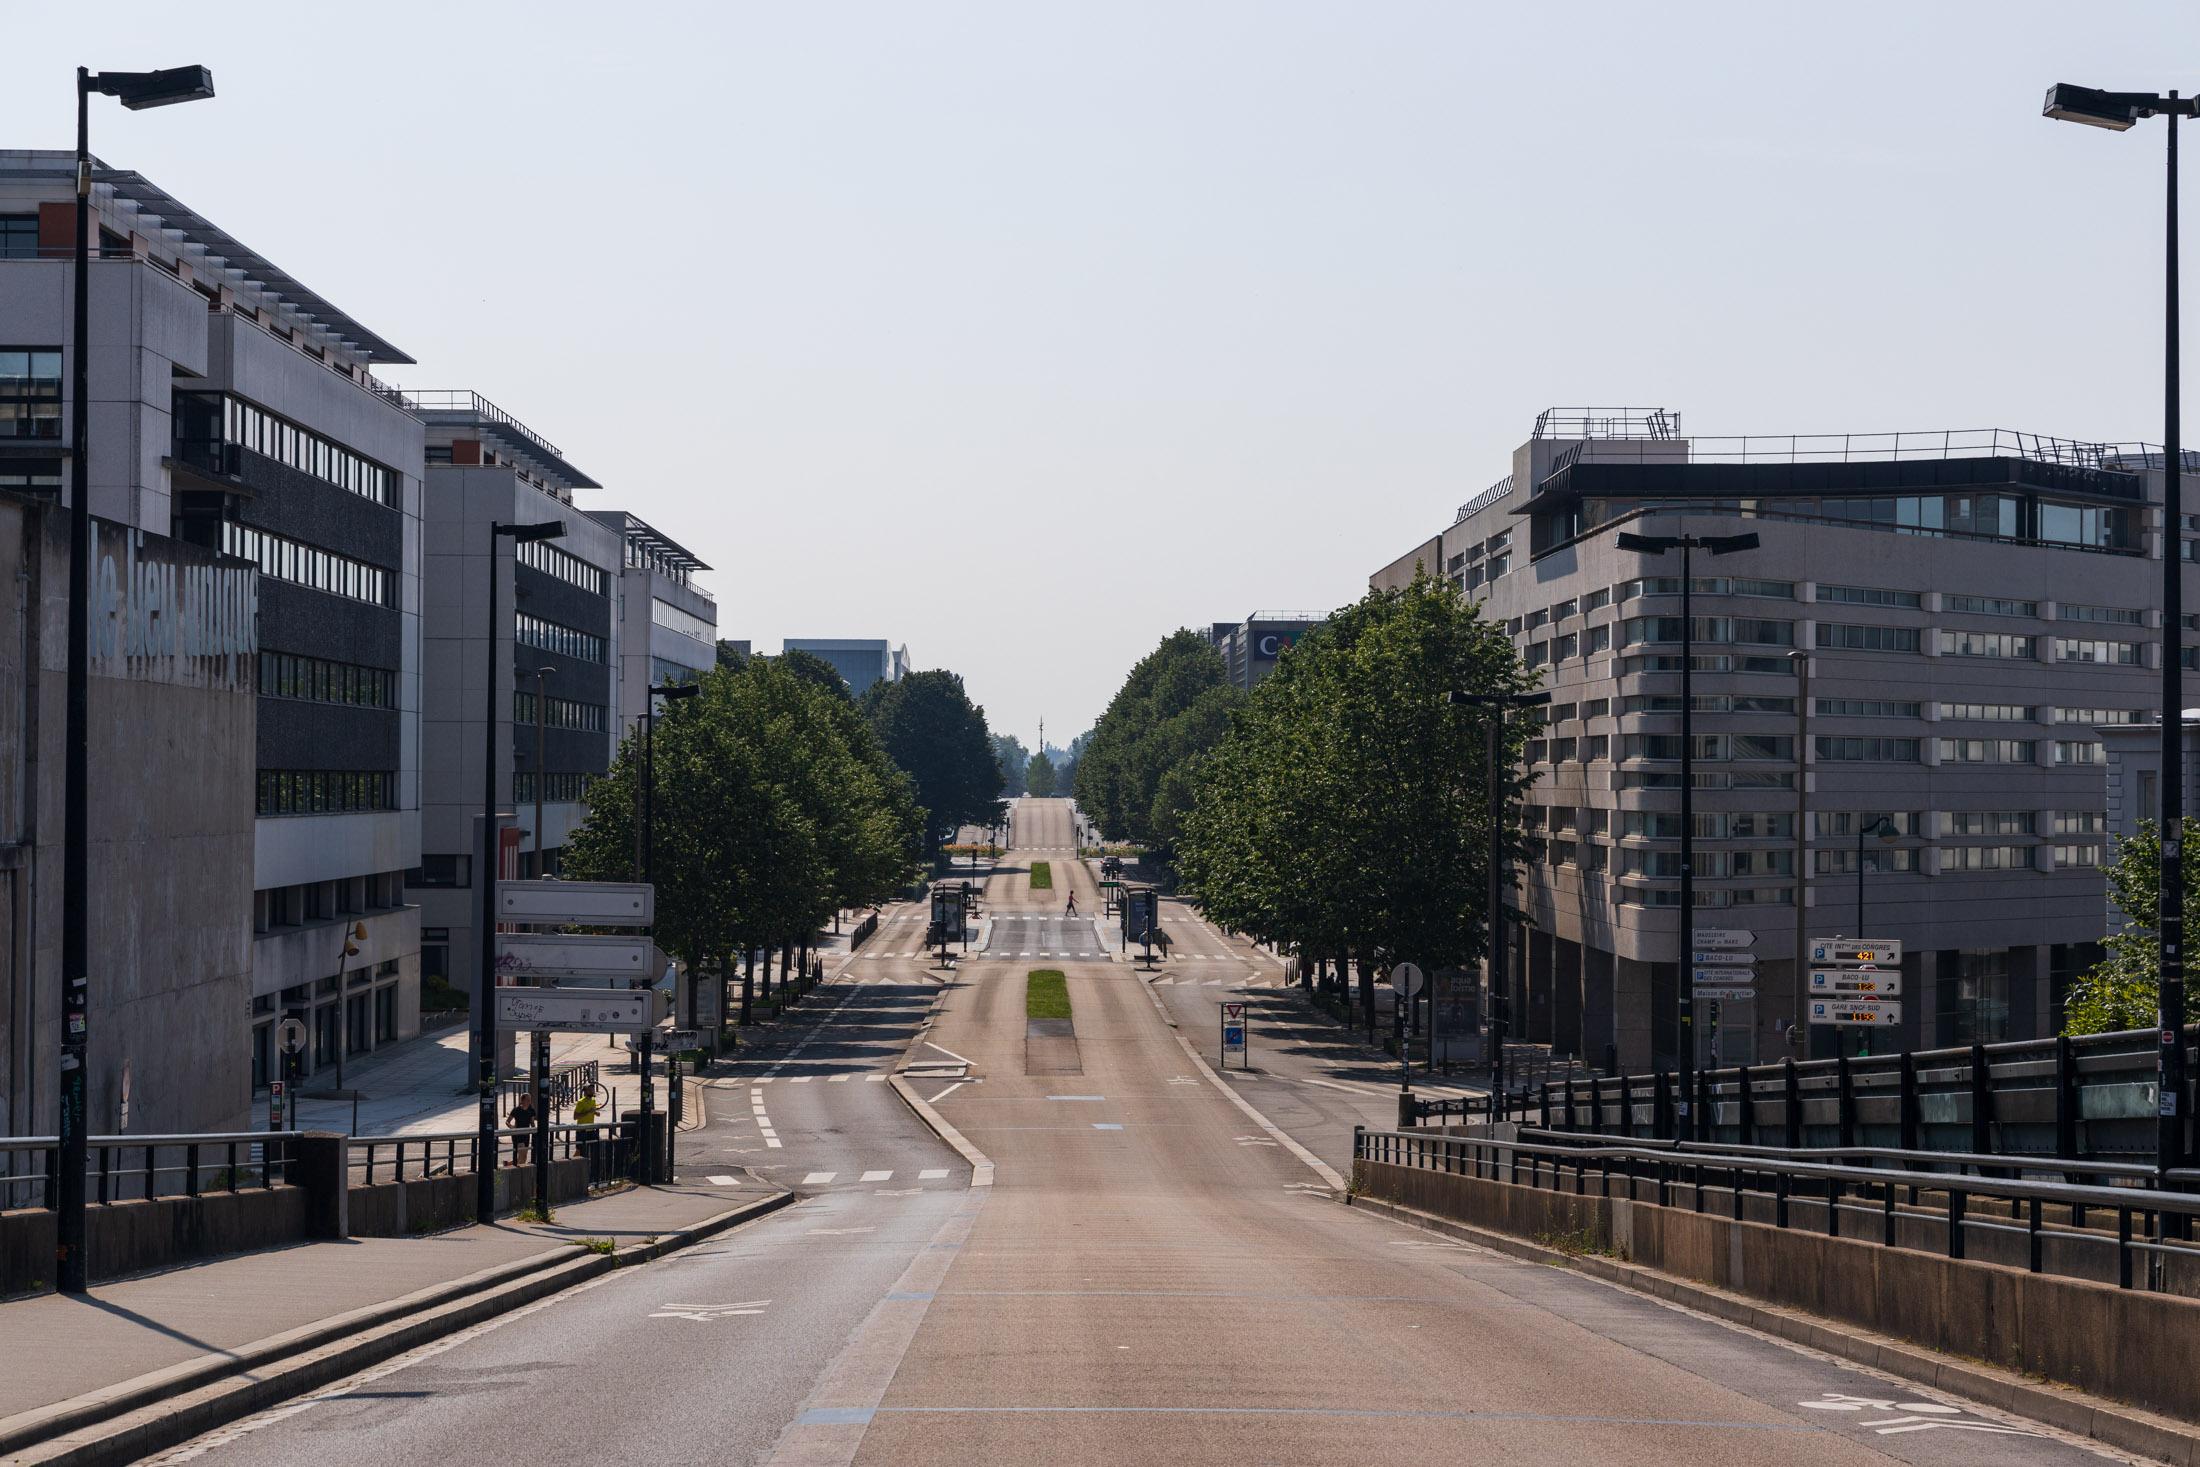 Carnot avenue is empty of all its traffic. Nantes, France - April 26th 2020.L'avenue Carnot vide de son trafic routier. Nantes, France - 26 avril 2020.